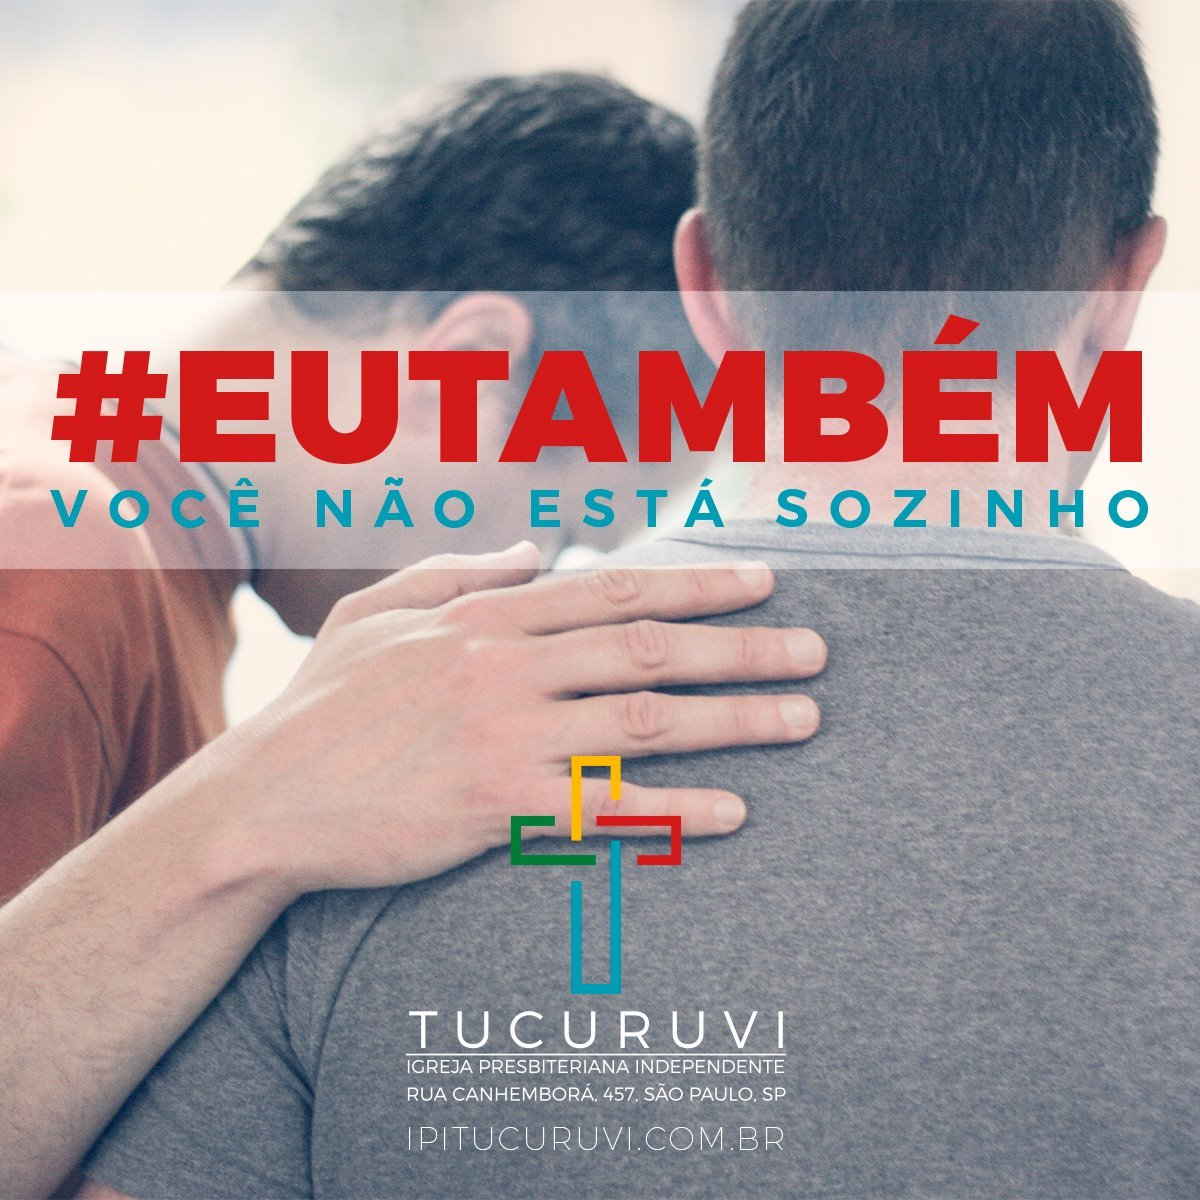 #EuTambém já pensei em suicídio - Aula